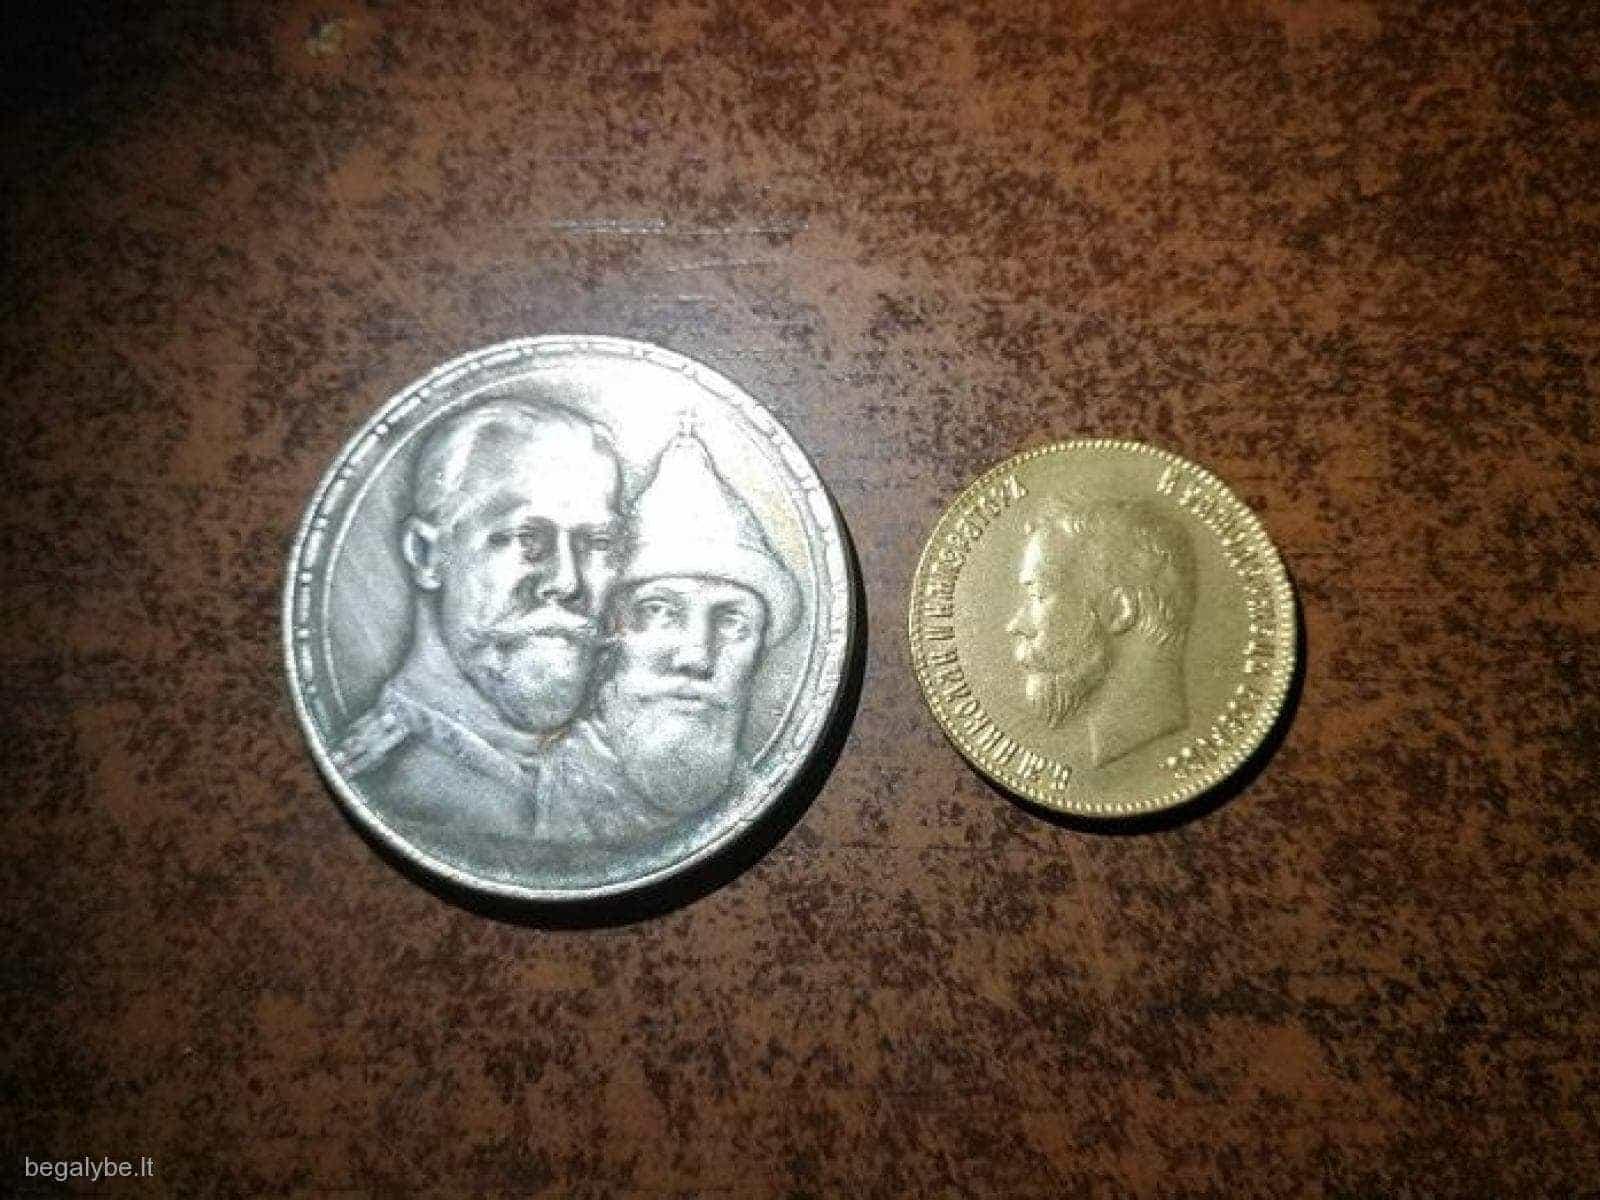 Pora caro monetų